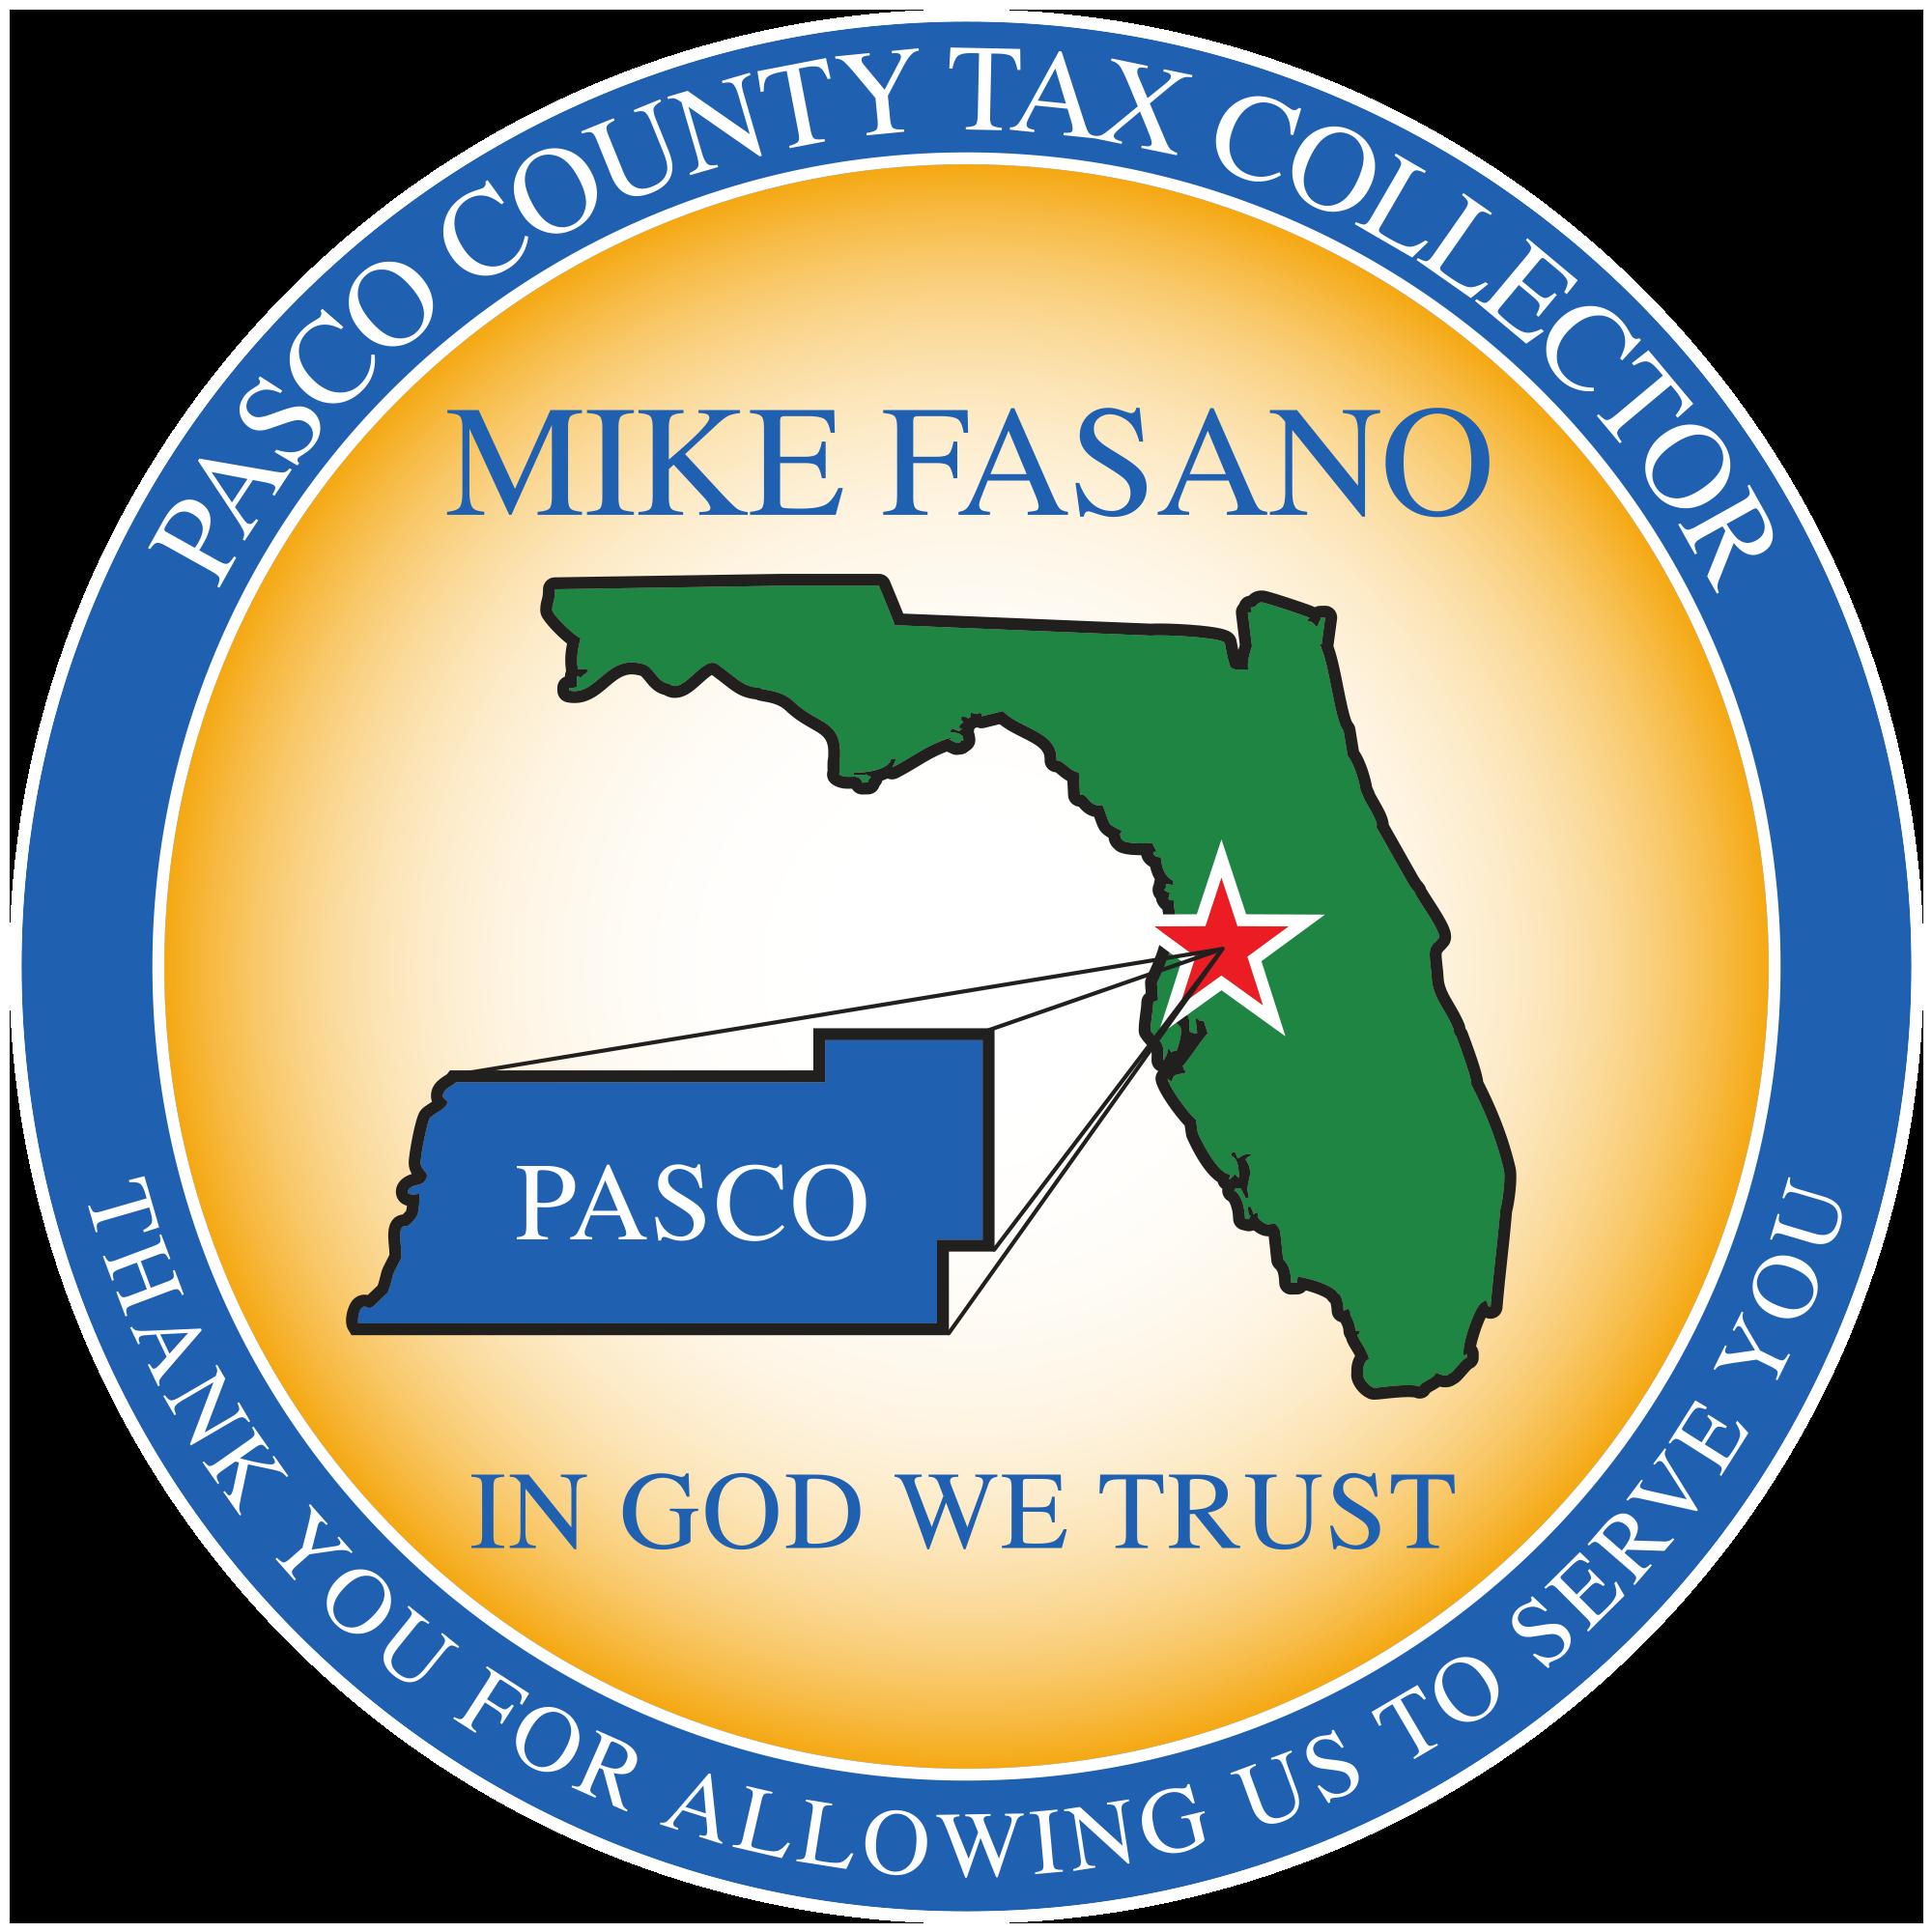 Pasco County Tax Collector